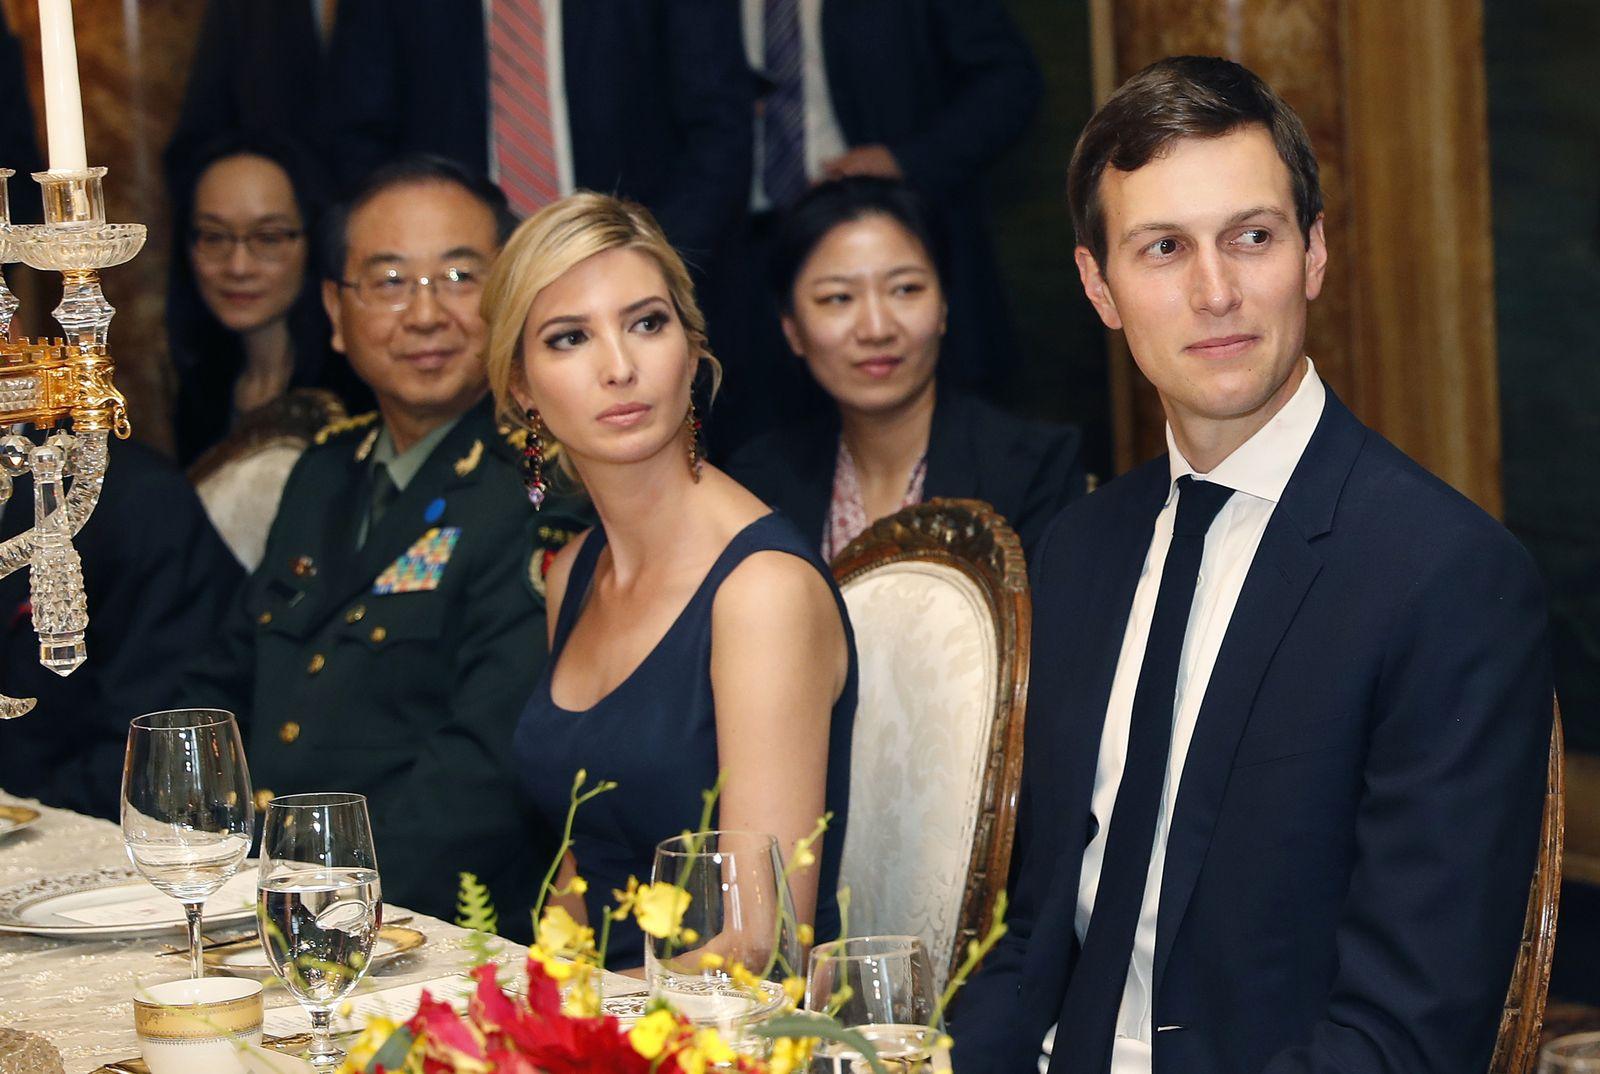 Ivanka Trump / Jared Kushner